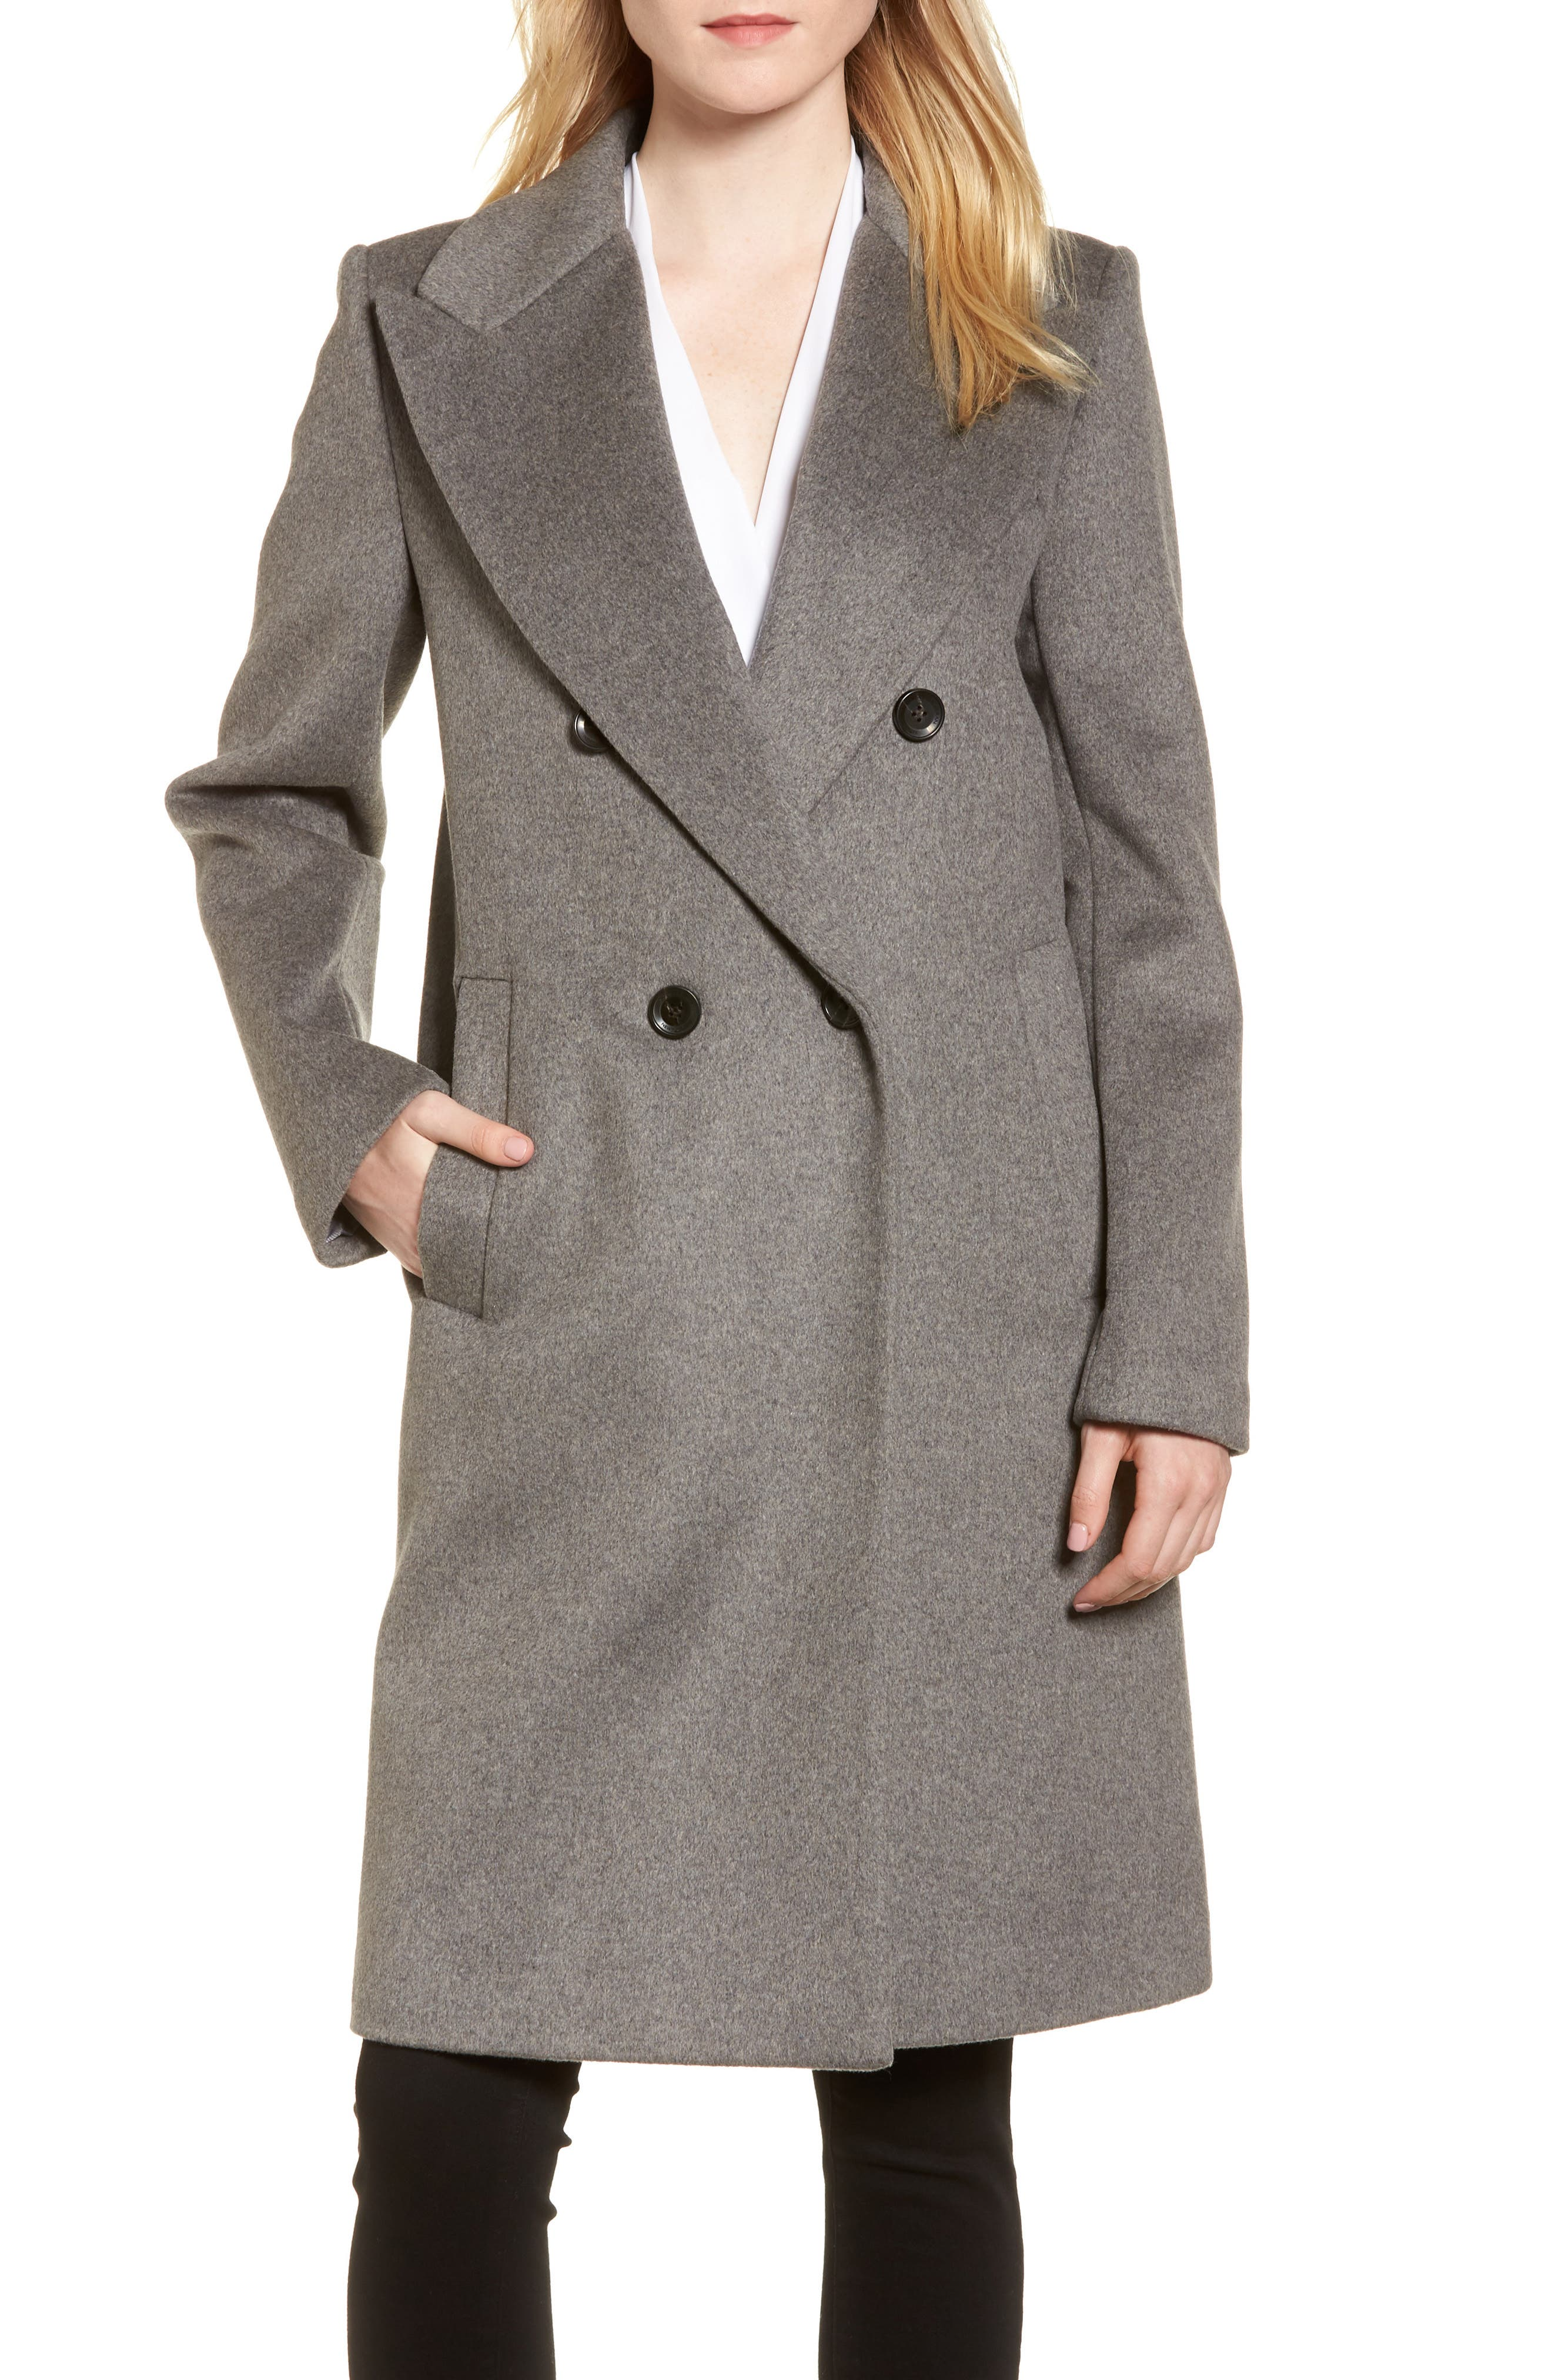 DKNY Lavish Wool Blend Coat,                             Main thumbnail 2, color,